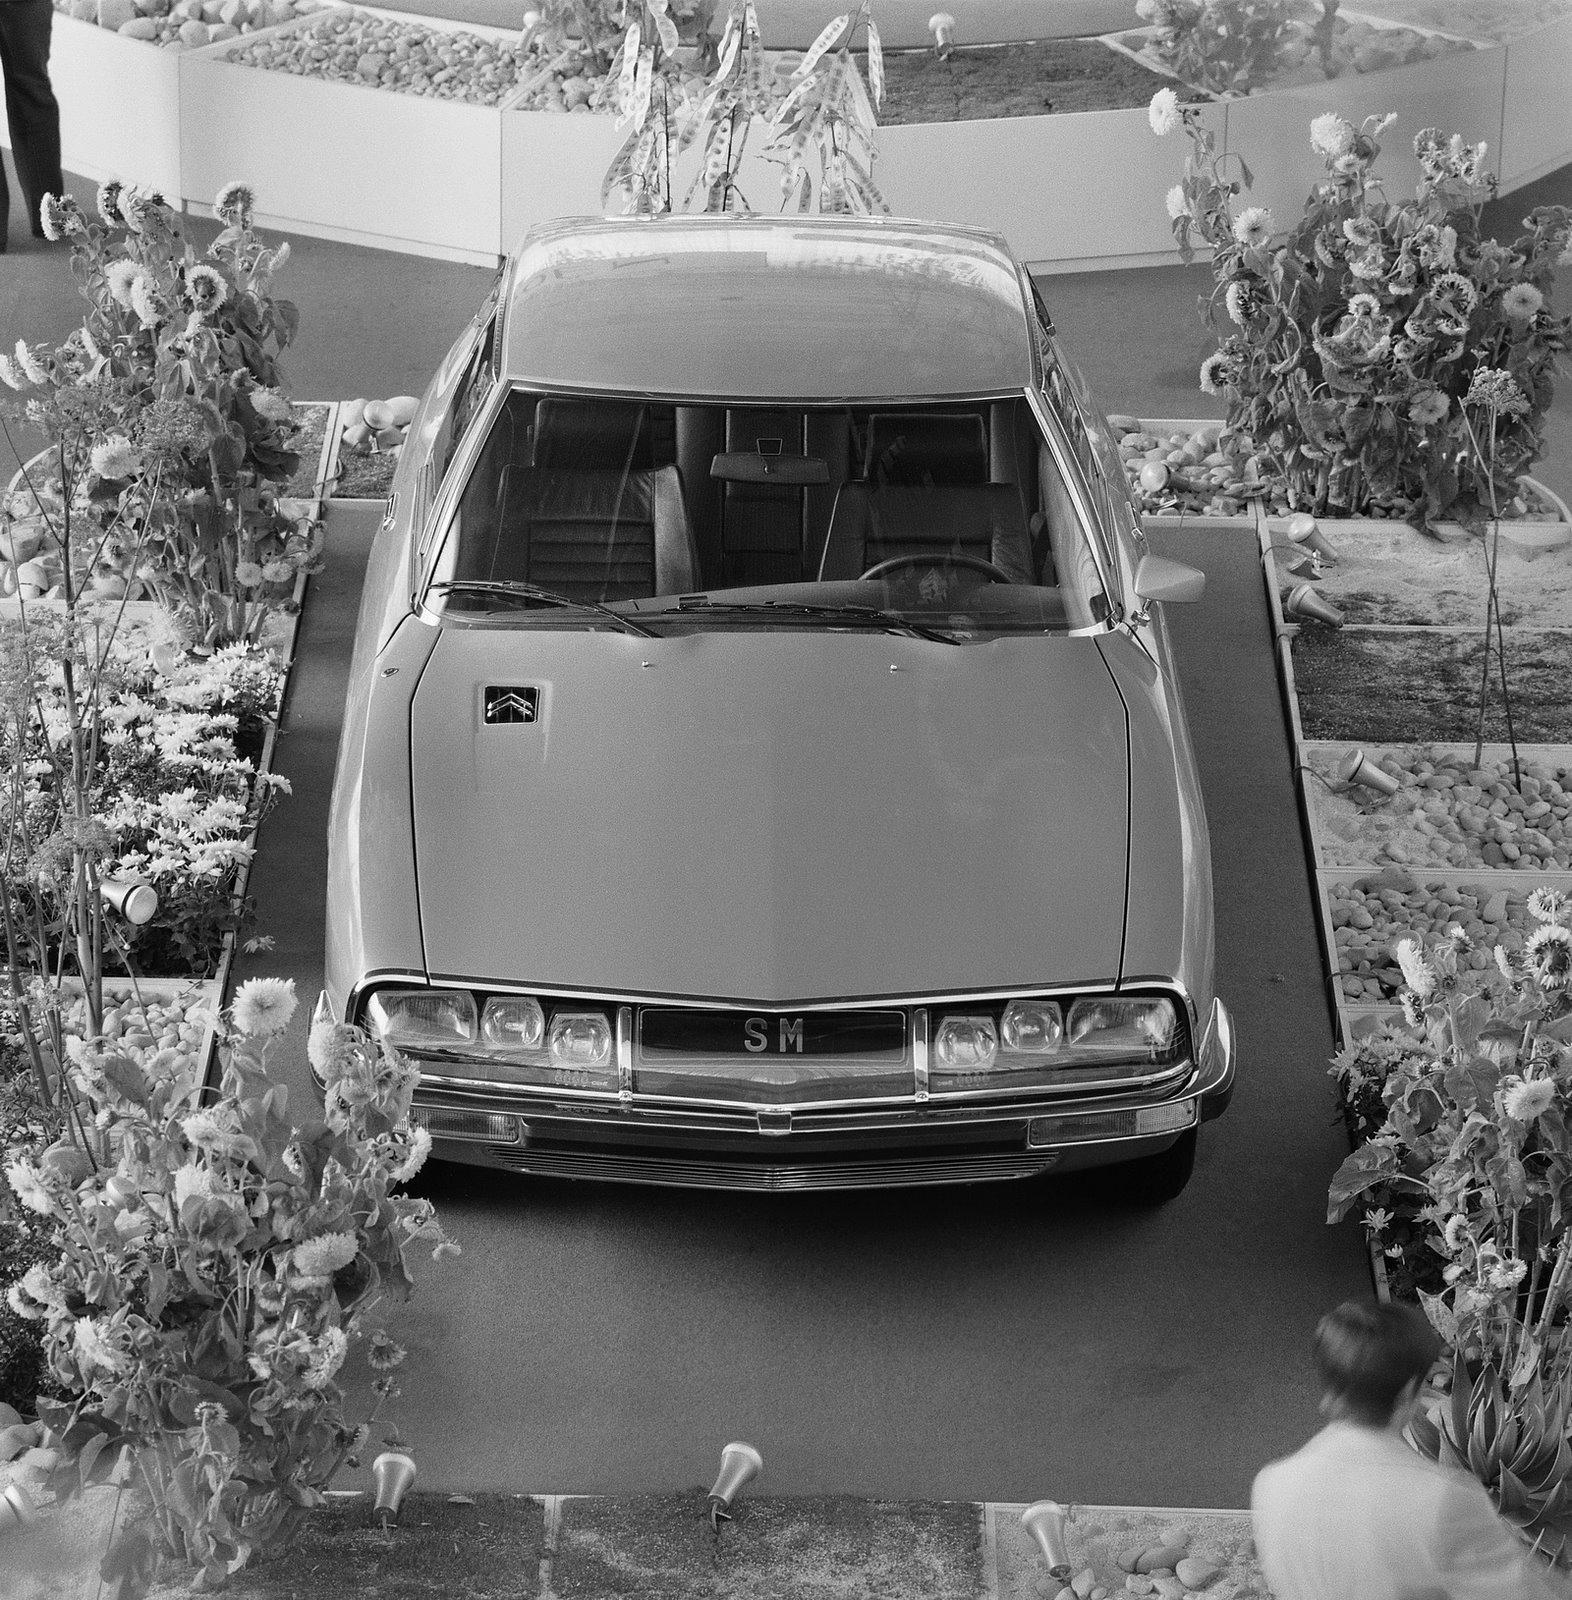 Citroen SM: Down Memory Lane With The Maserati-Powered